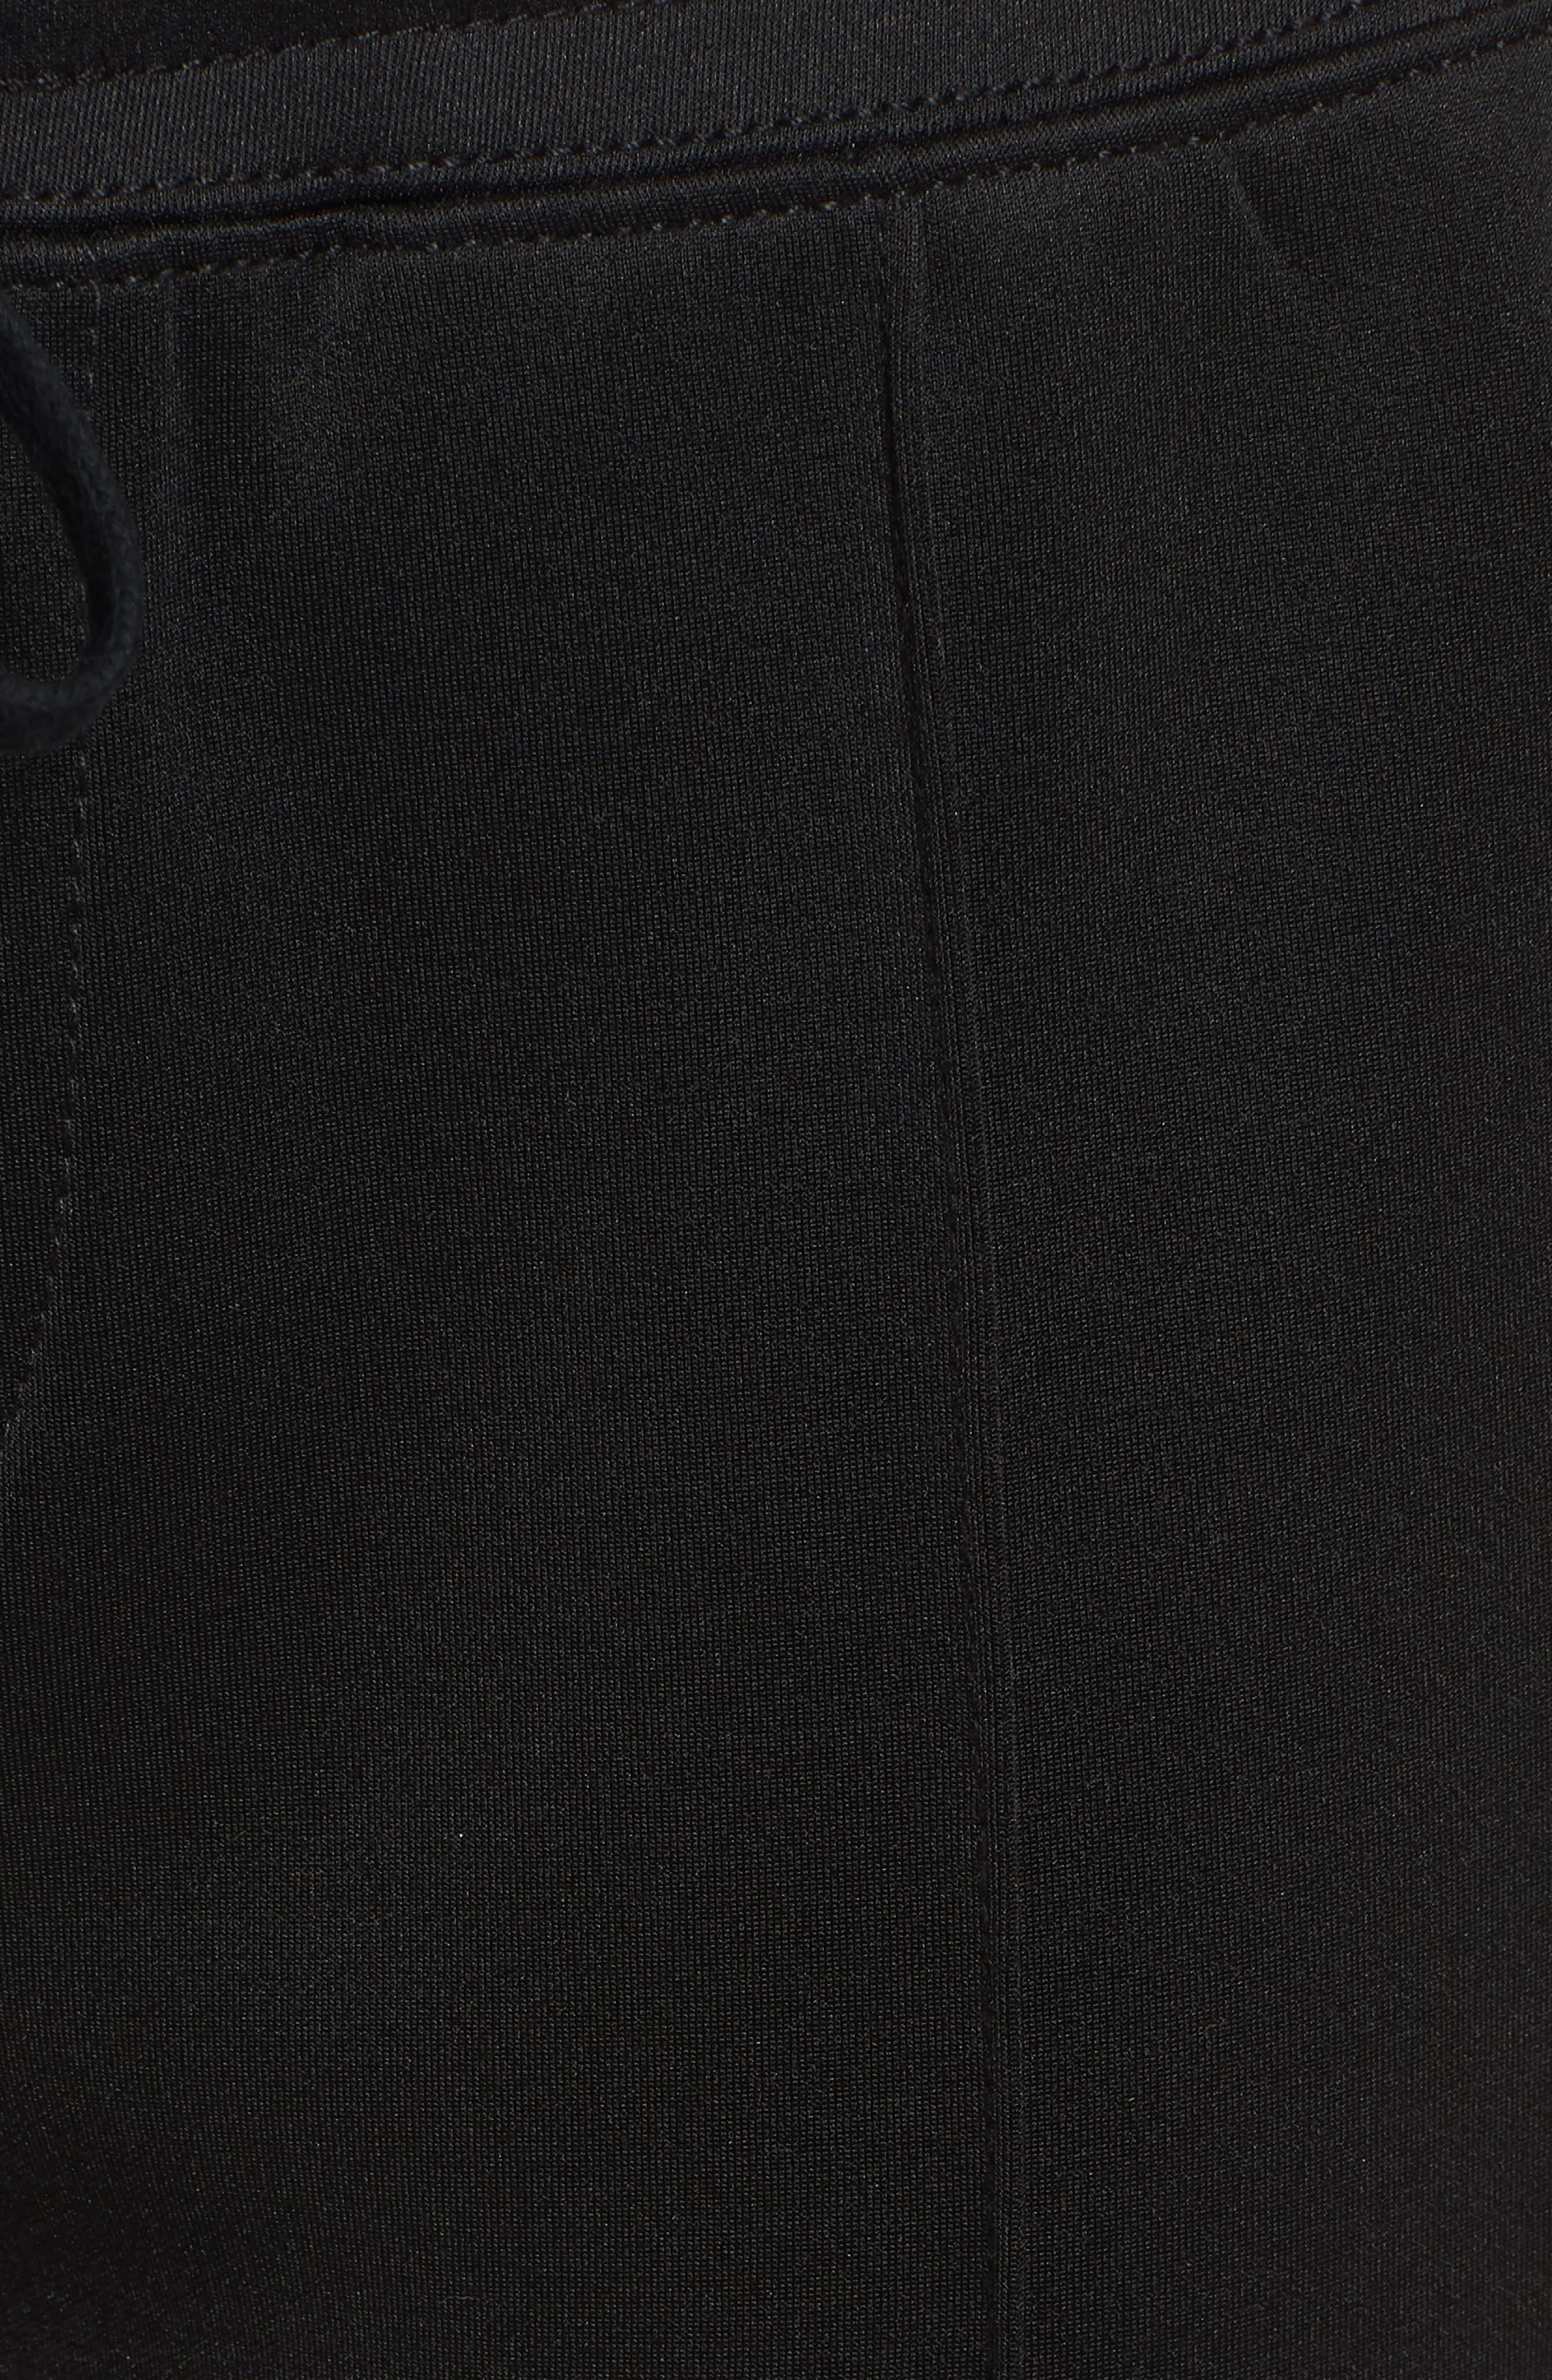 Cigarette Track Pants,                             Alternate thumbnail 6, color,                             Black